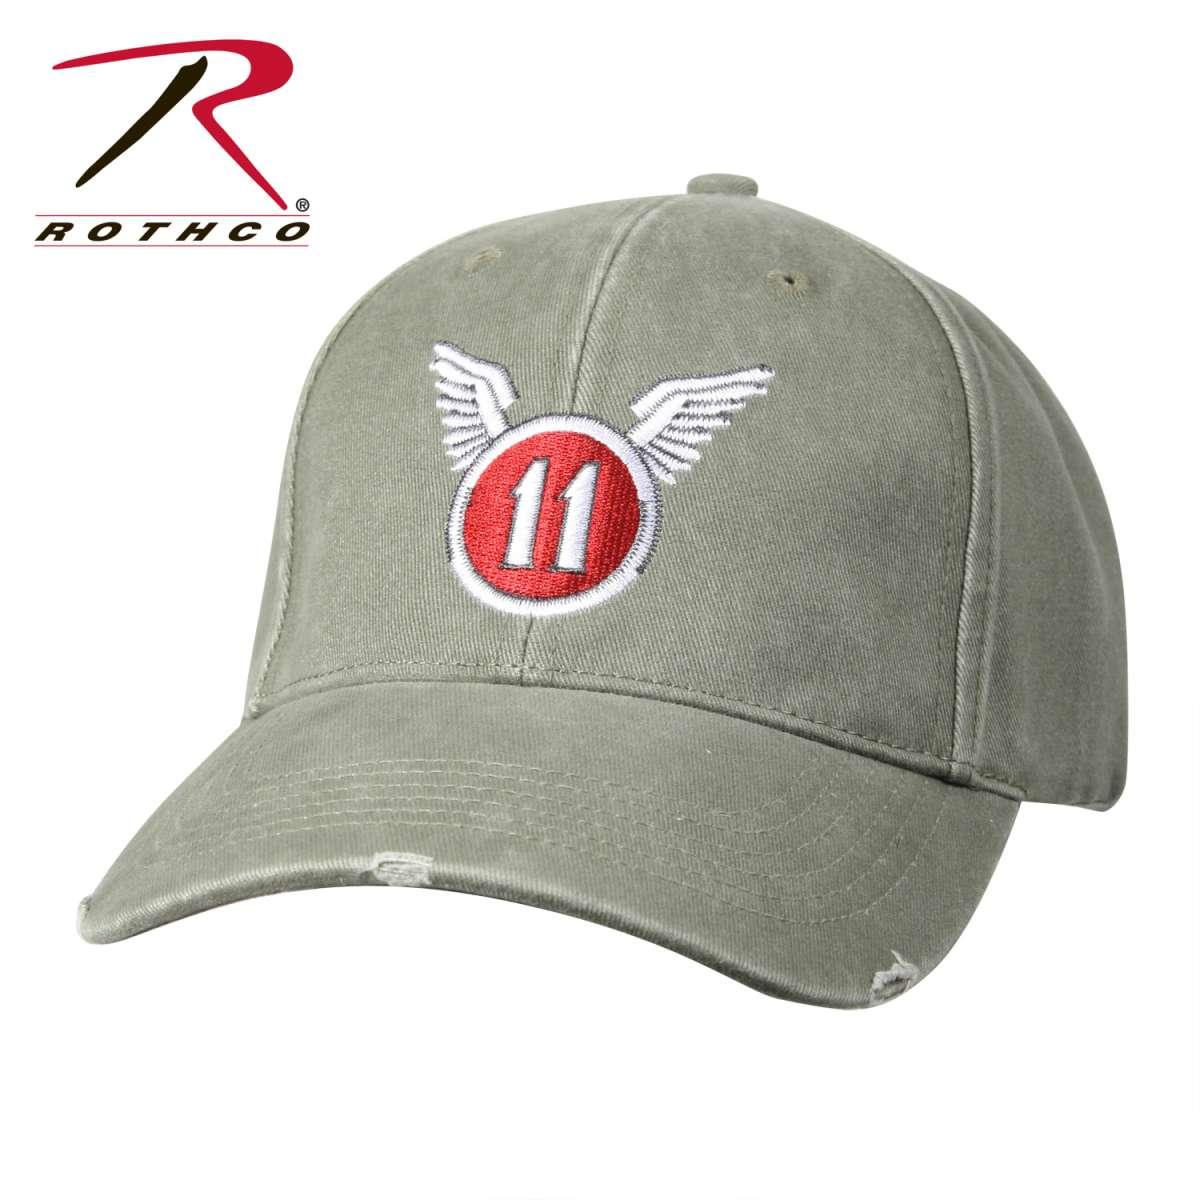 Кепка бейсболка Vintage 11th Airborne производства Rothco NY, USA